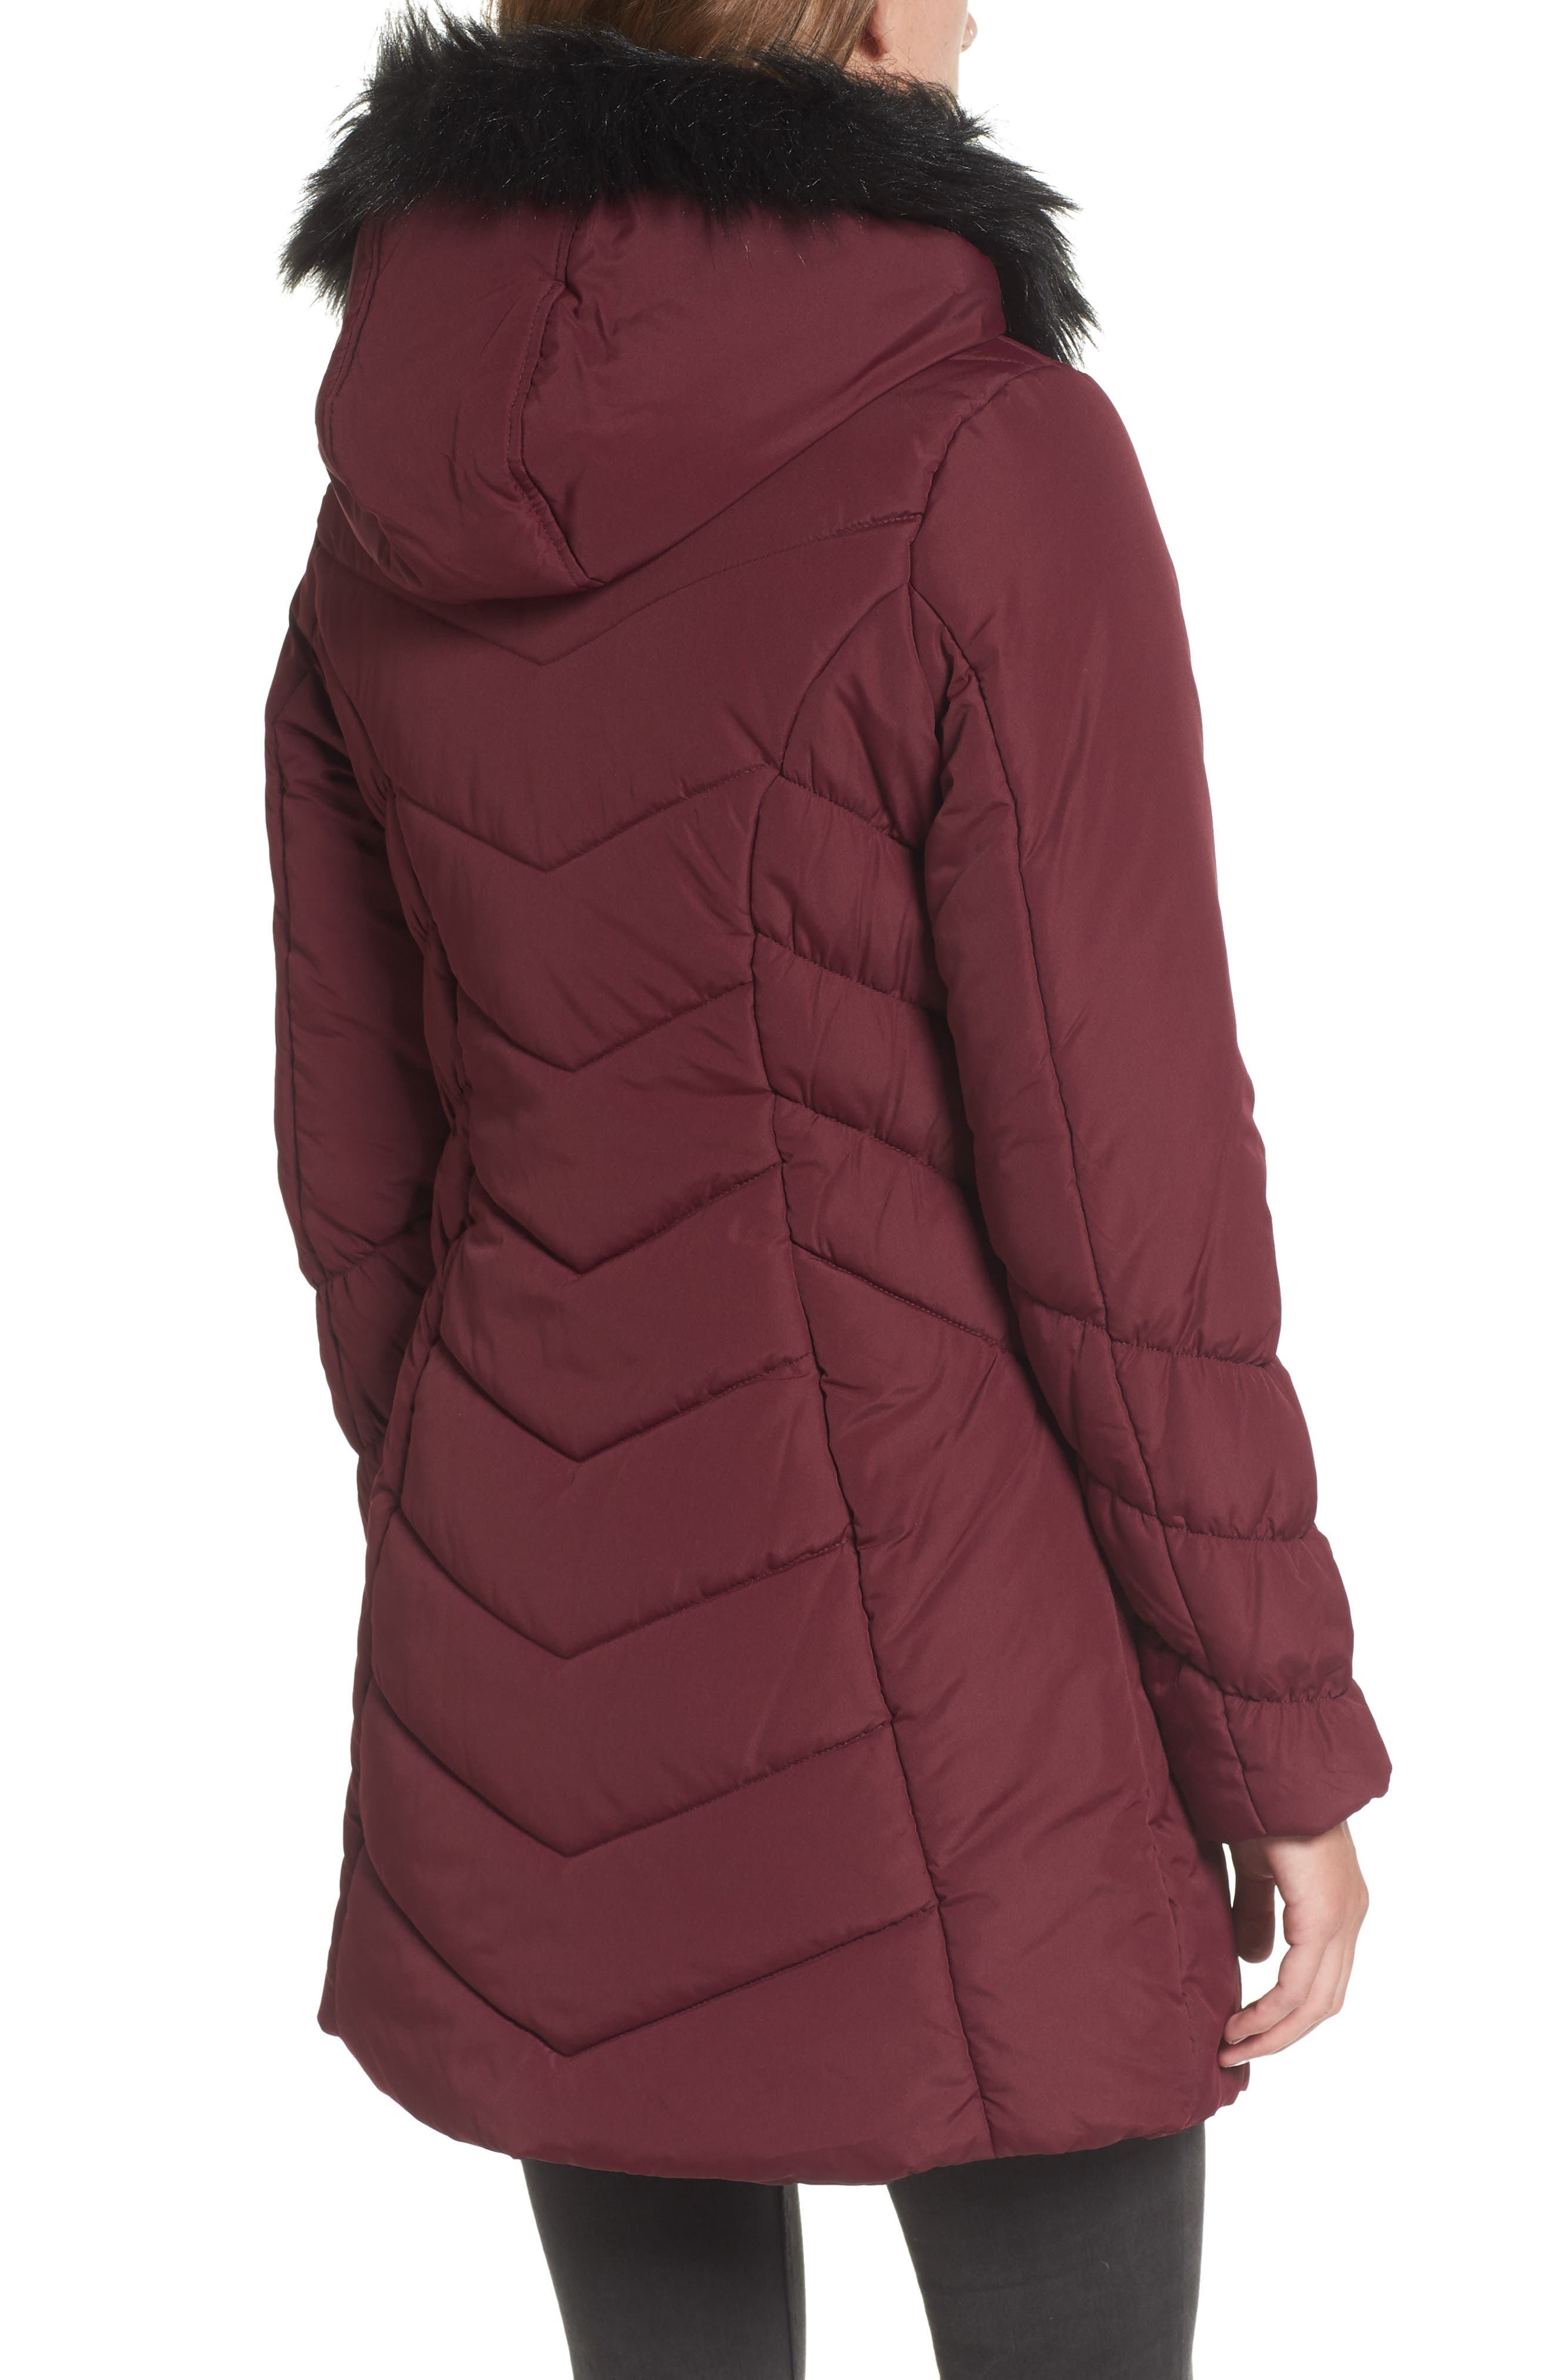 Faux Fur Trim Hooded Puffer Jacket,                             Alternate thumbnail 2, color,                             930